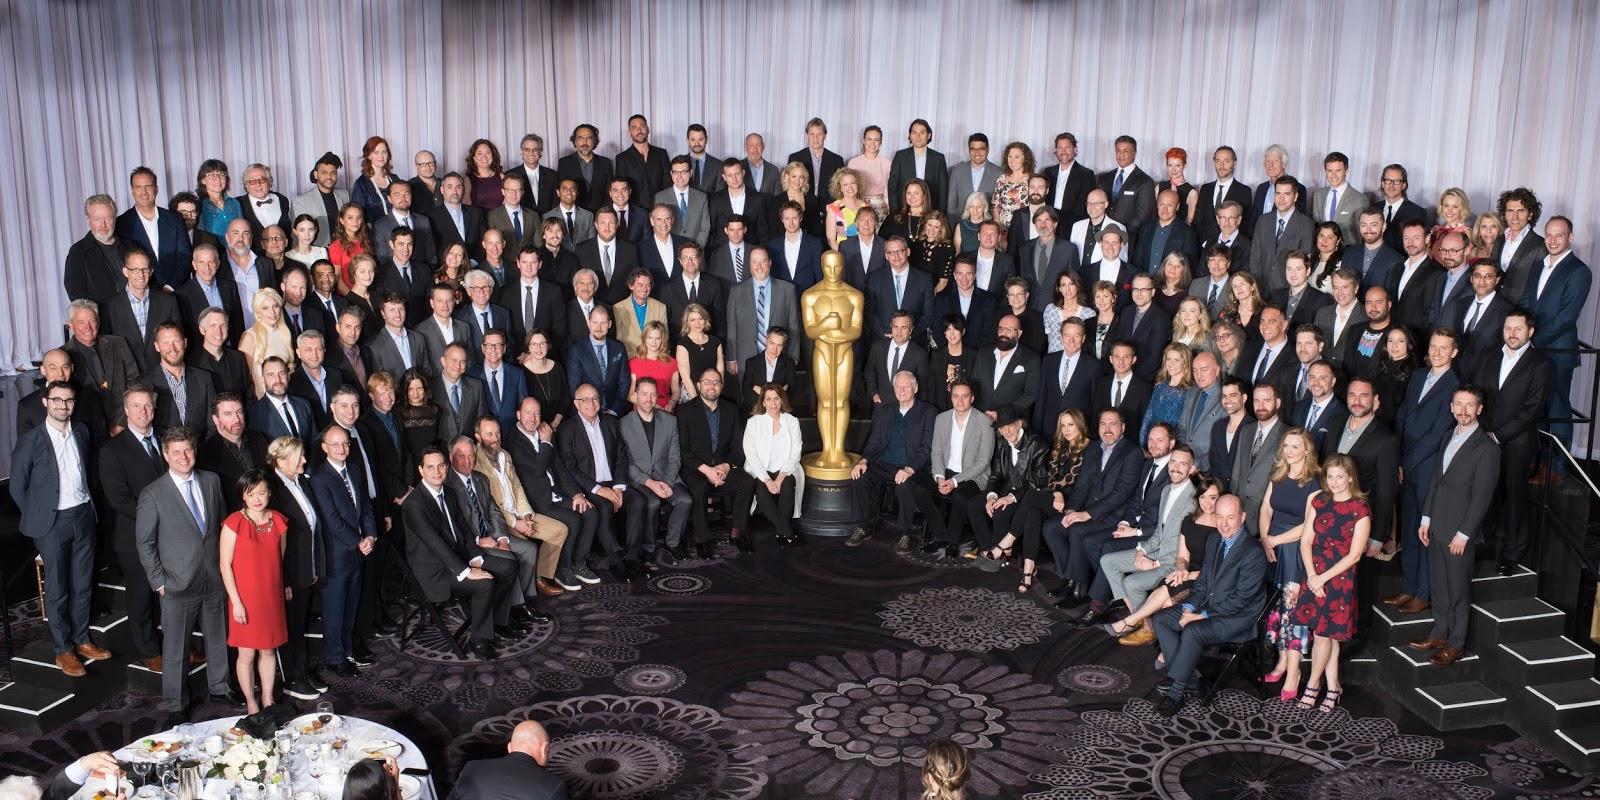 Oscar2016Almuerzonominados